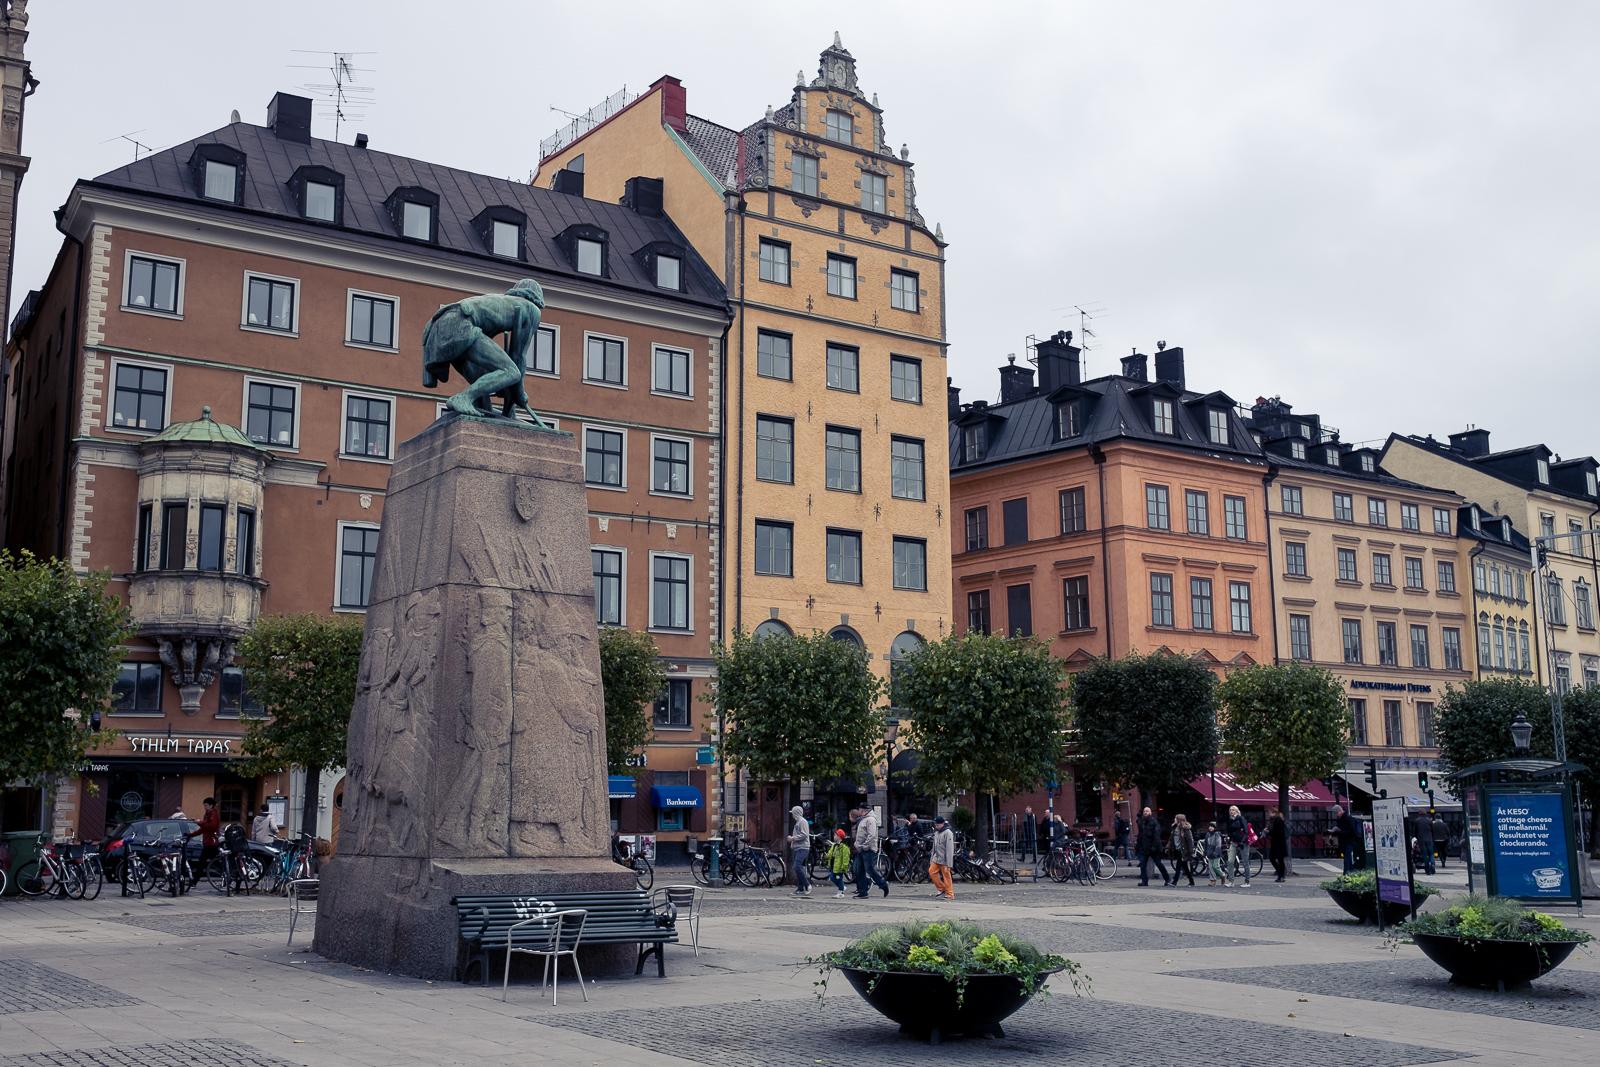 Kornhamnstorg, Gamla Stan, Stockholm